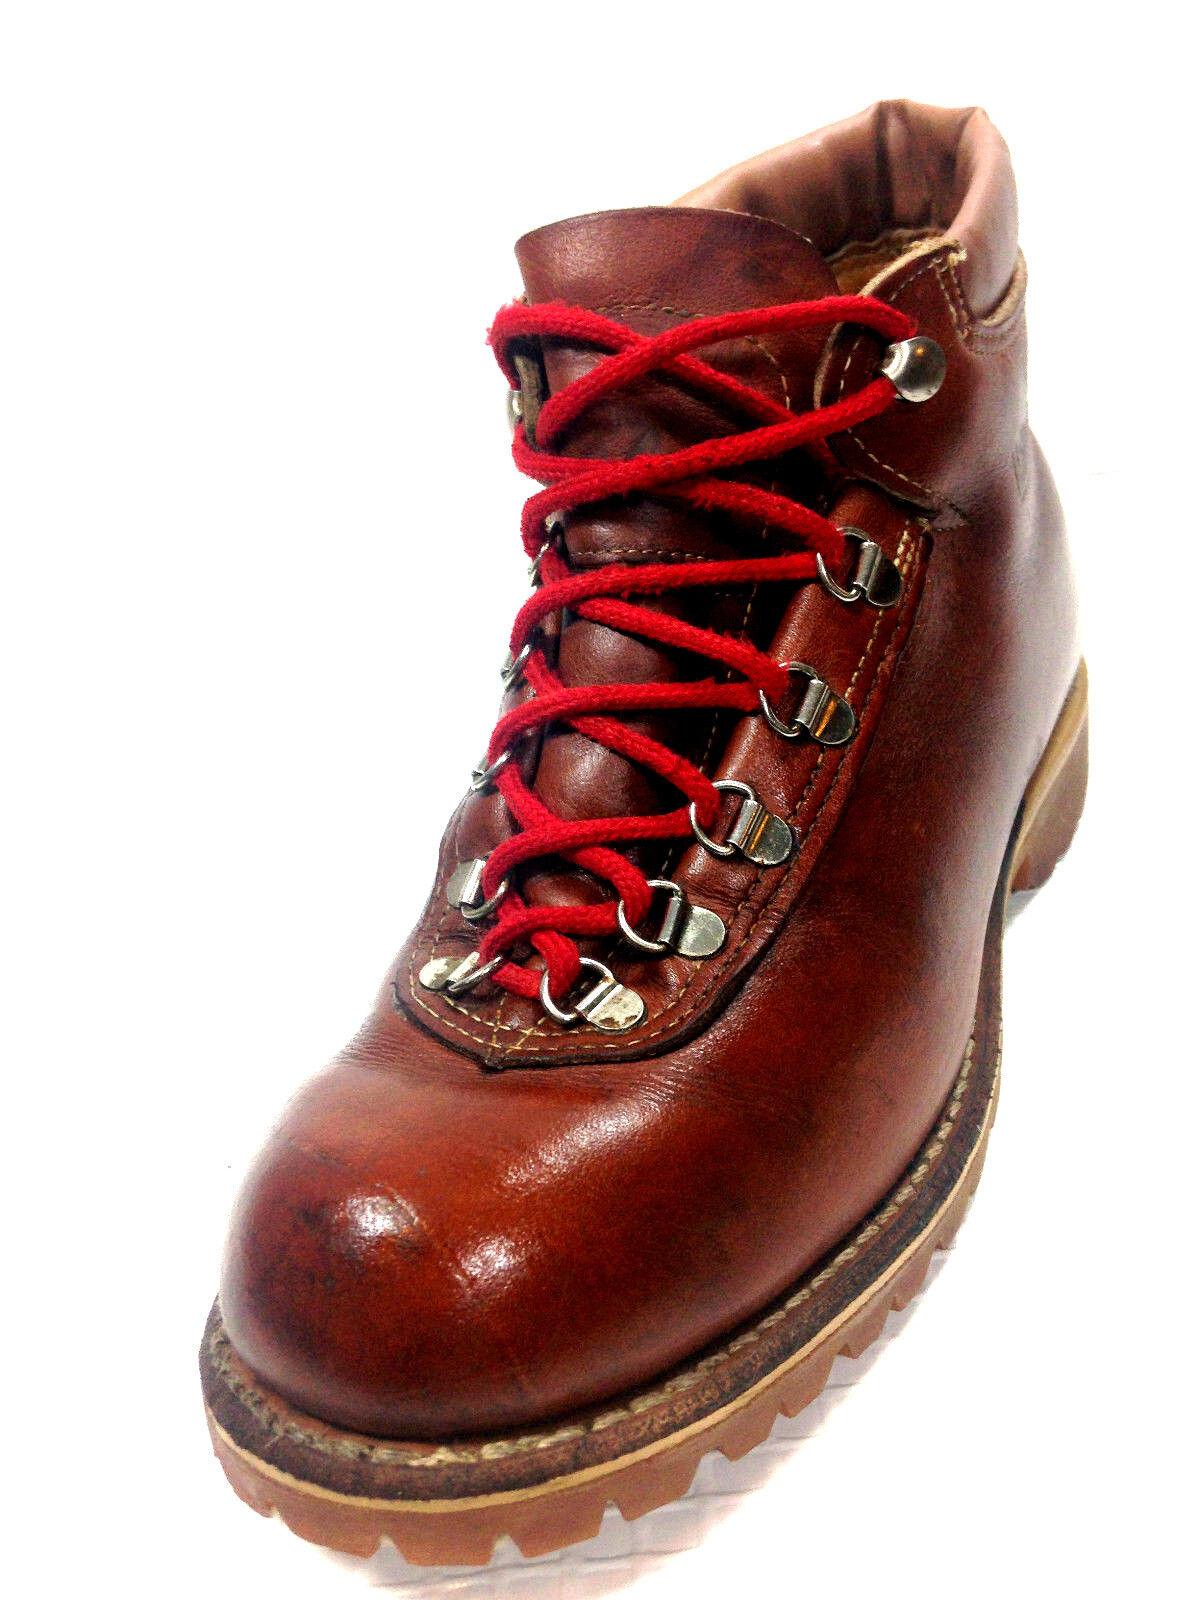 Matterhorn Vintage Trail Hiking Brown Boots Uomo Size 7.5 USA.